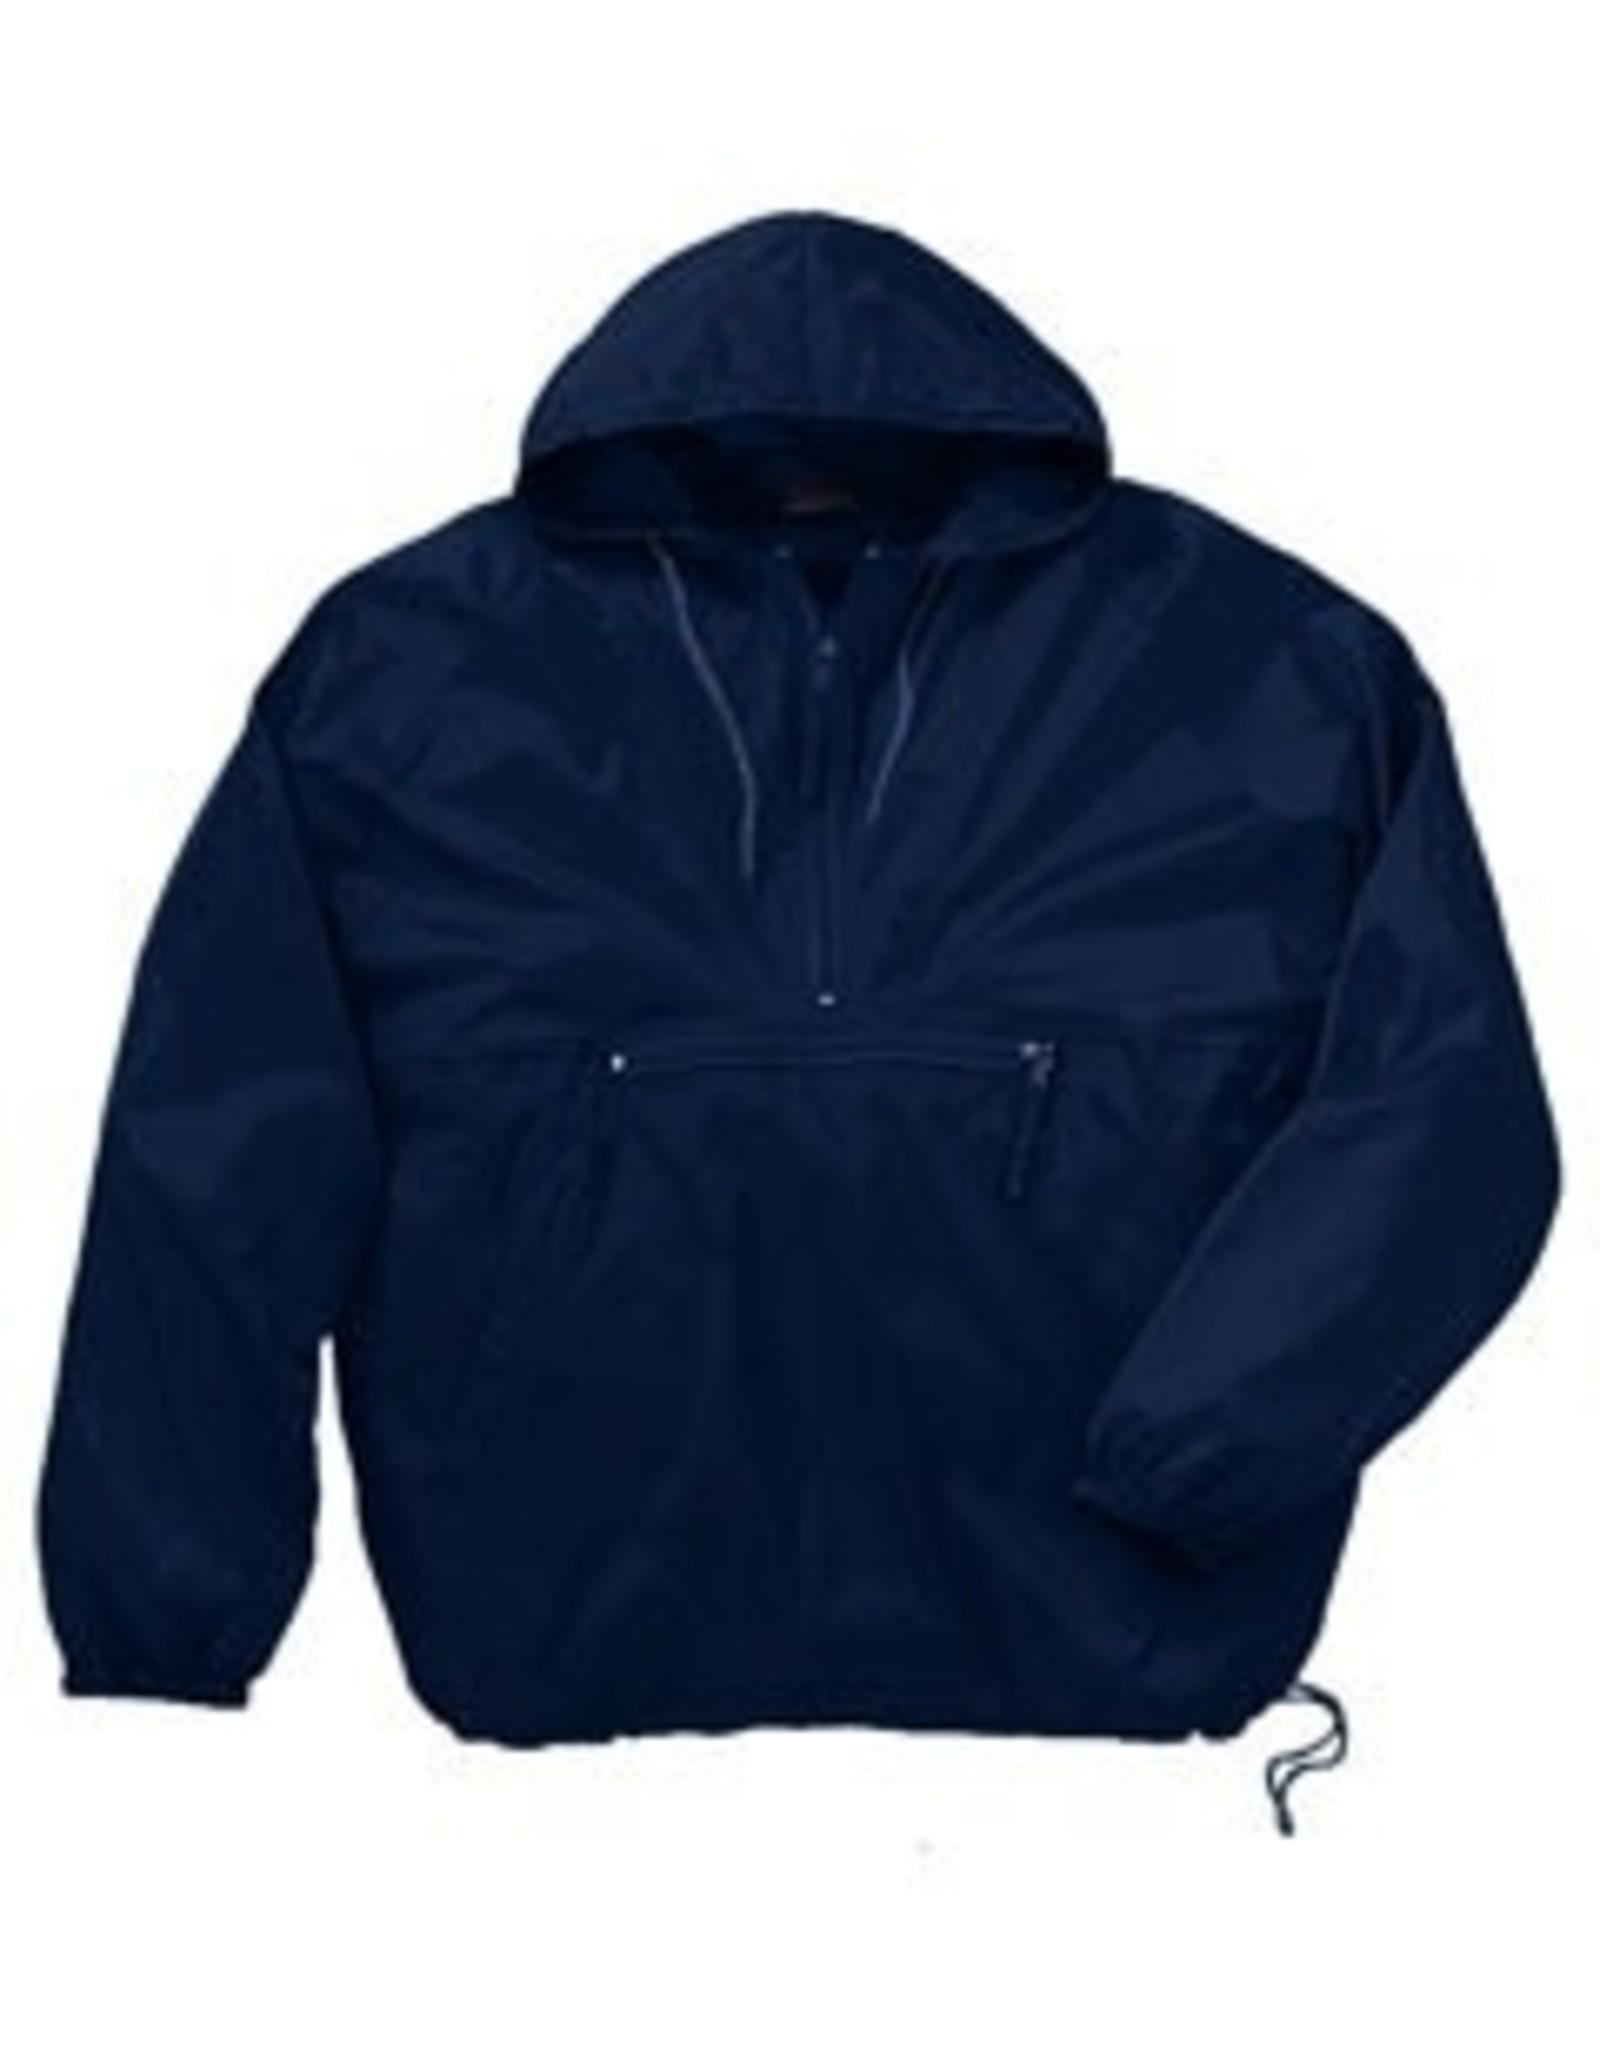 NON-UNIFORM Windbreaker Jacket, pack-n-go 1/2 zip pullover, Custom Order